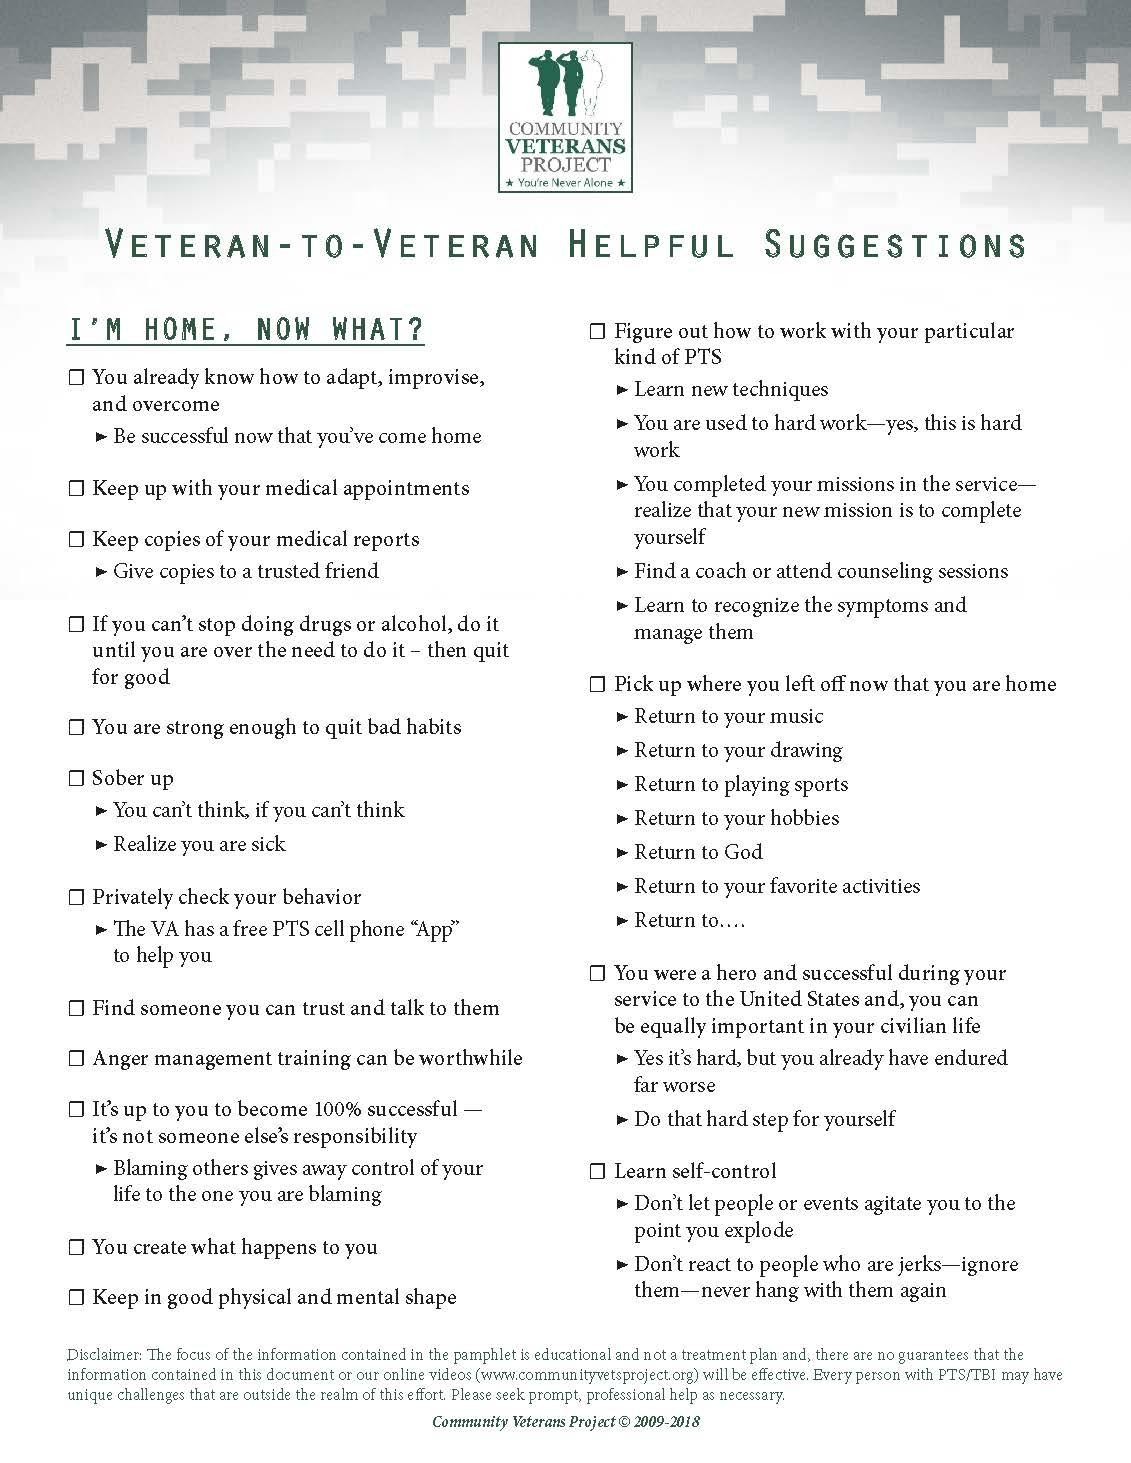 V2V_Suggestions_Page_1.jpg